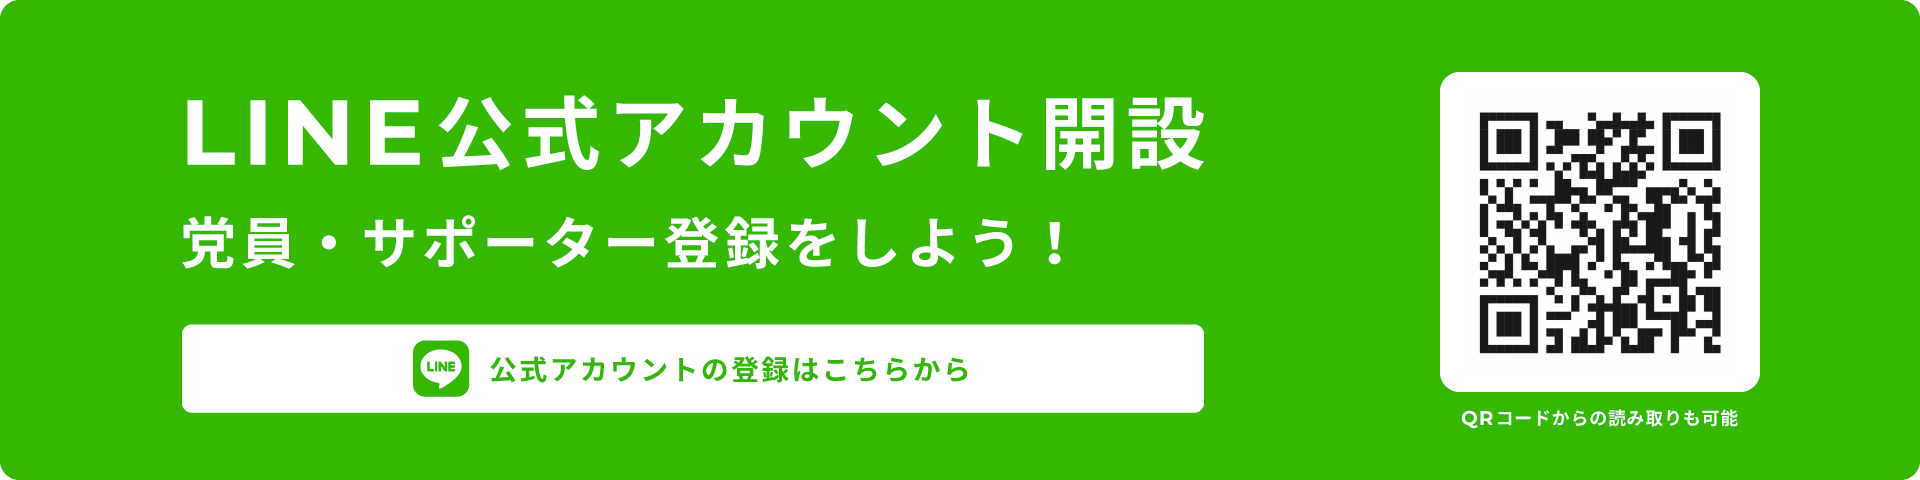 LINE公式アカウント開設 党員・サポーター登録をしよう!